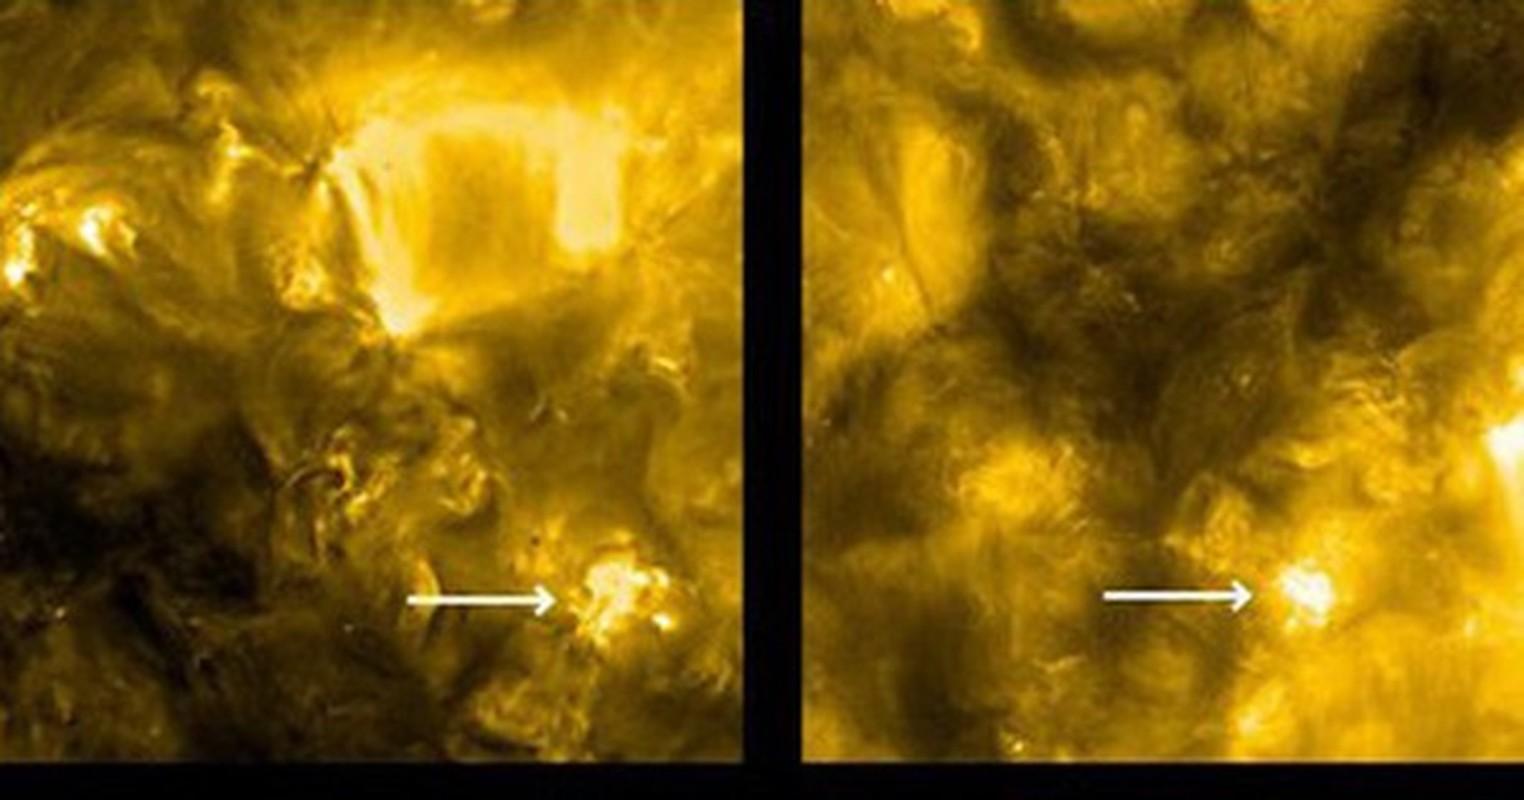 Xuat hien vat the den bi an trong anh chup Mat Troi cua NASA-Hinh-6